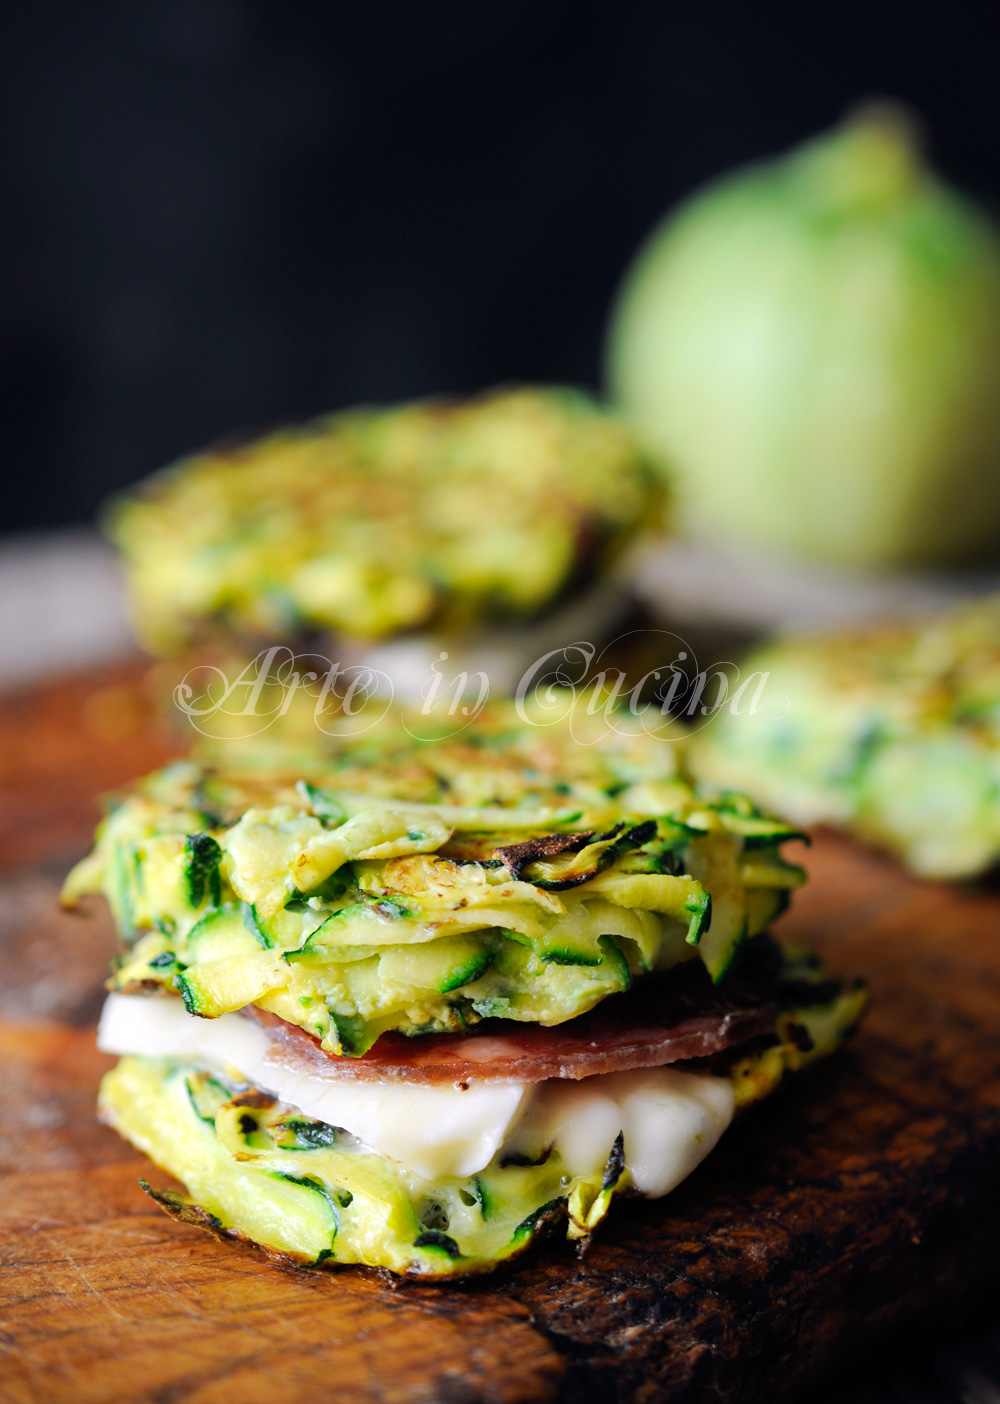 Hamburger di zucchine farcite ricetta veloce vickyart arte in cucina